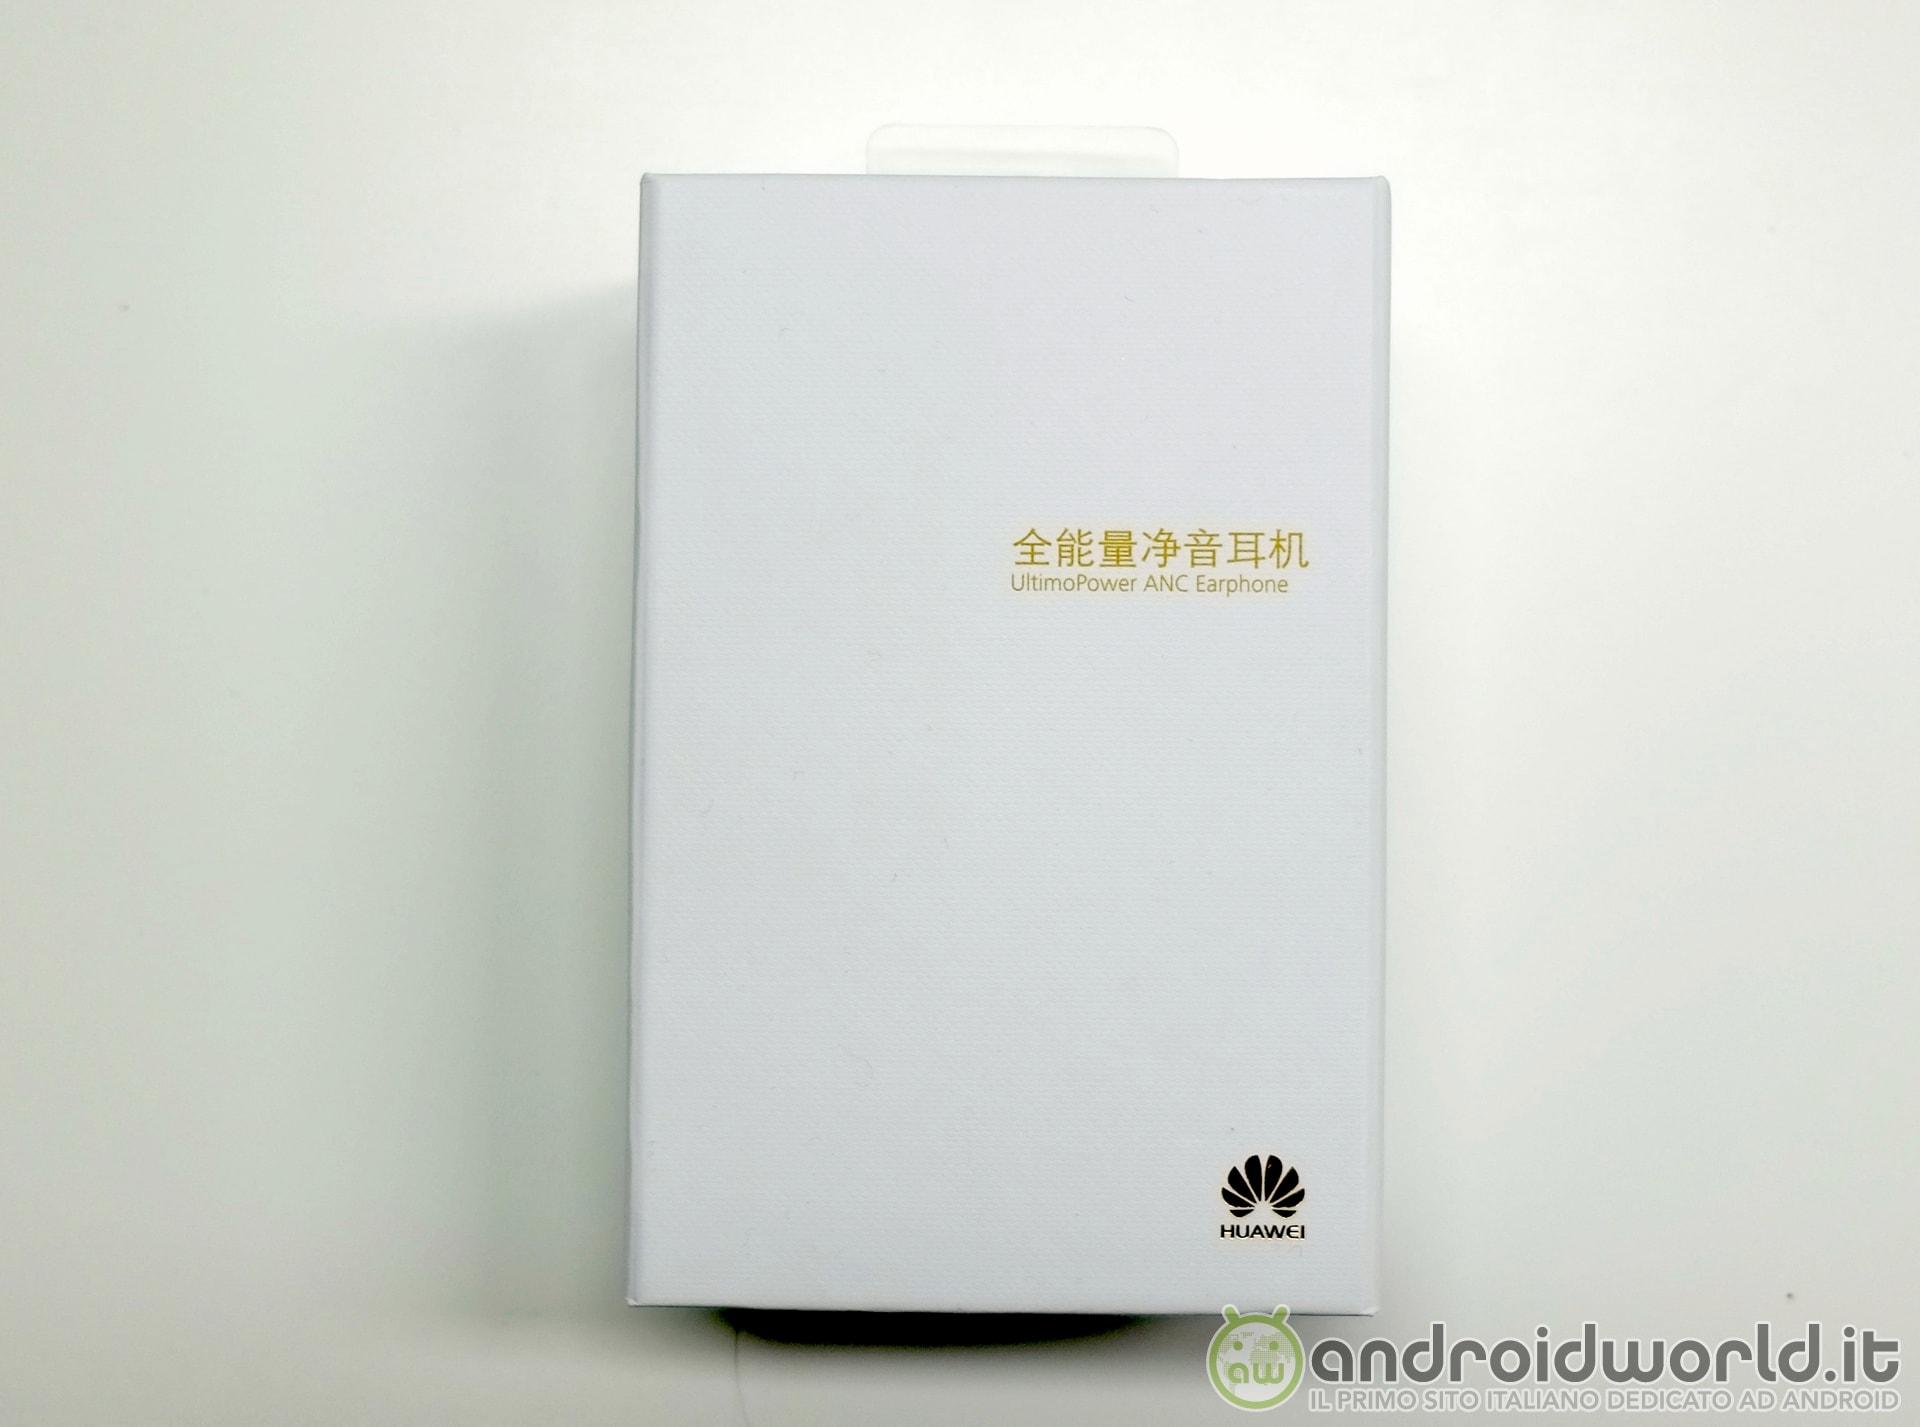 Huawei UltimoPower ANC AM180 -10